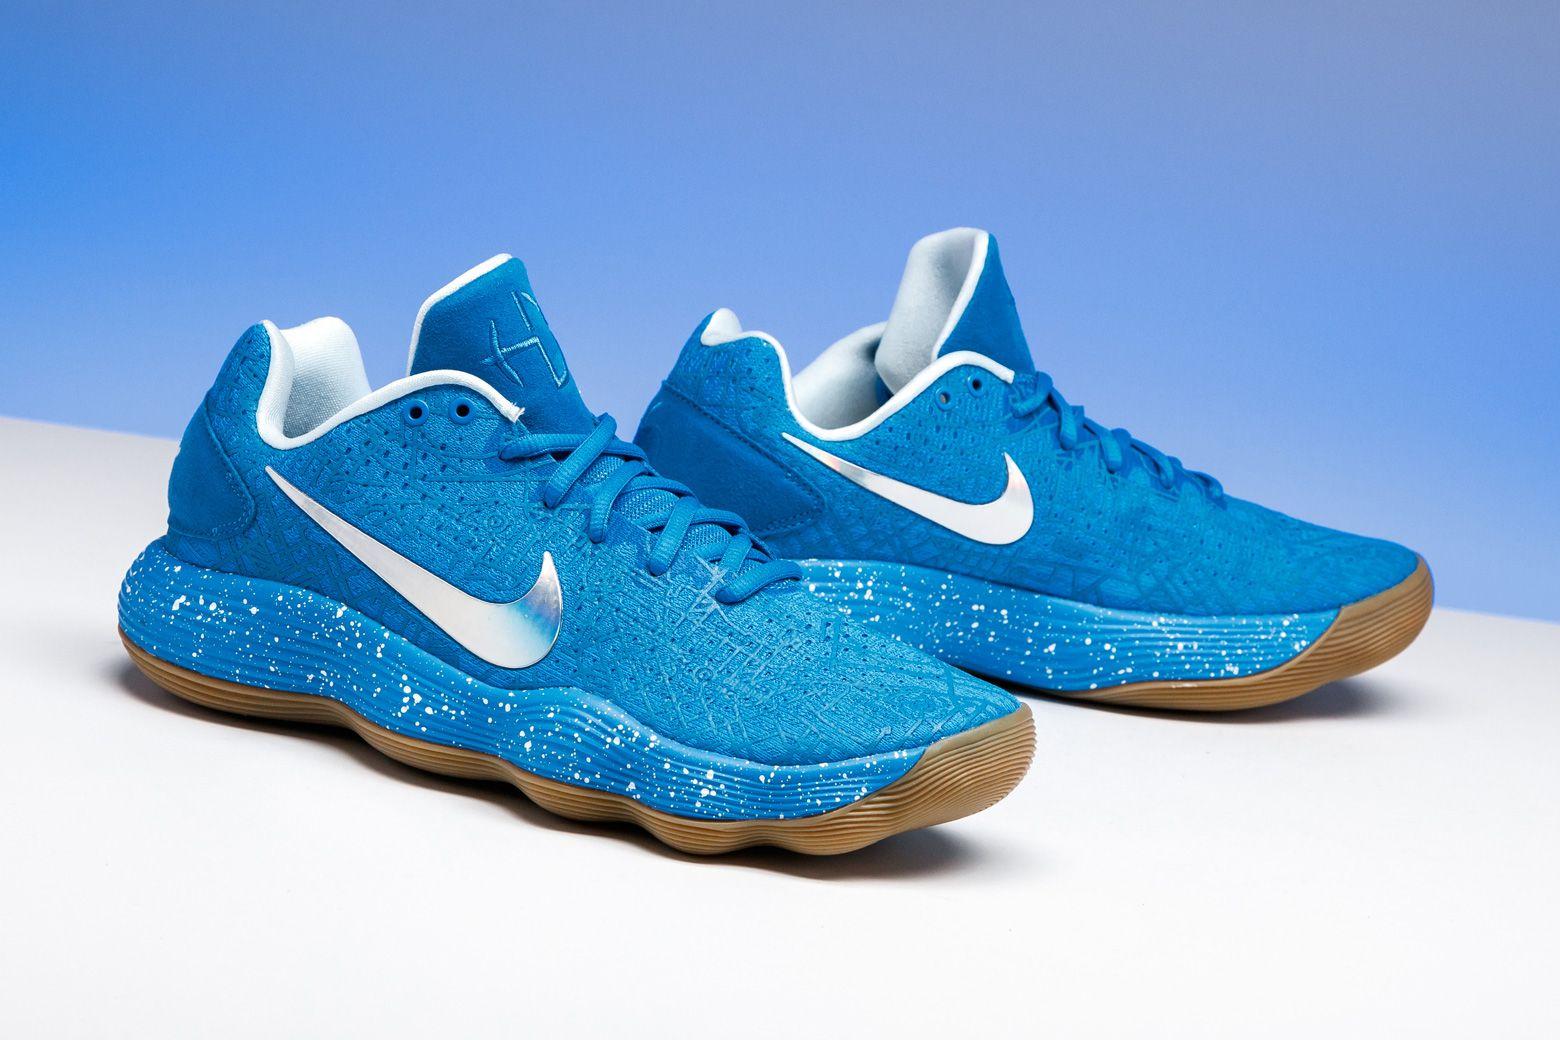 cb40fa3d1d84 Details about Nike Zoom Kobe Venomenon 5 EP Air X 10 Kobe Bryant Mens Basketball  Shoes Pick 1